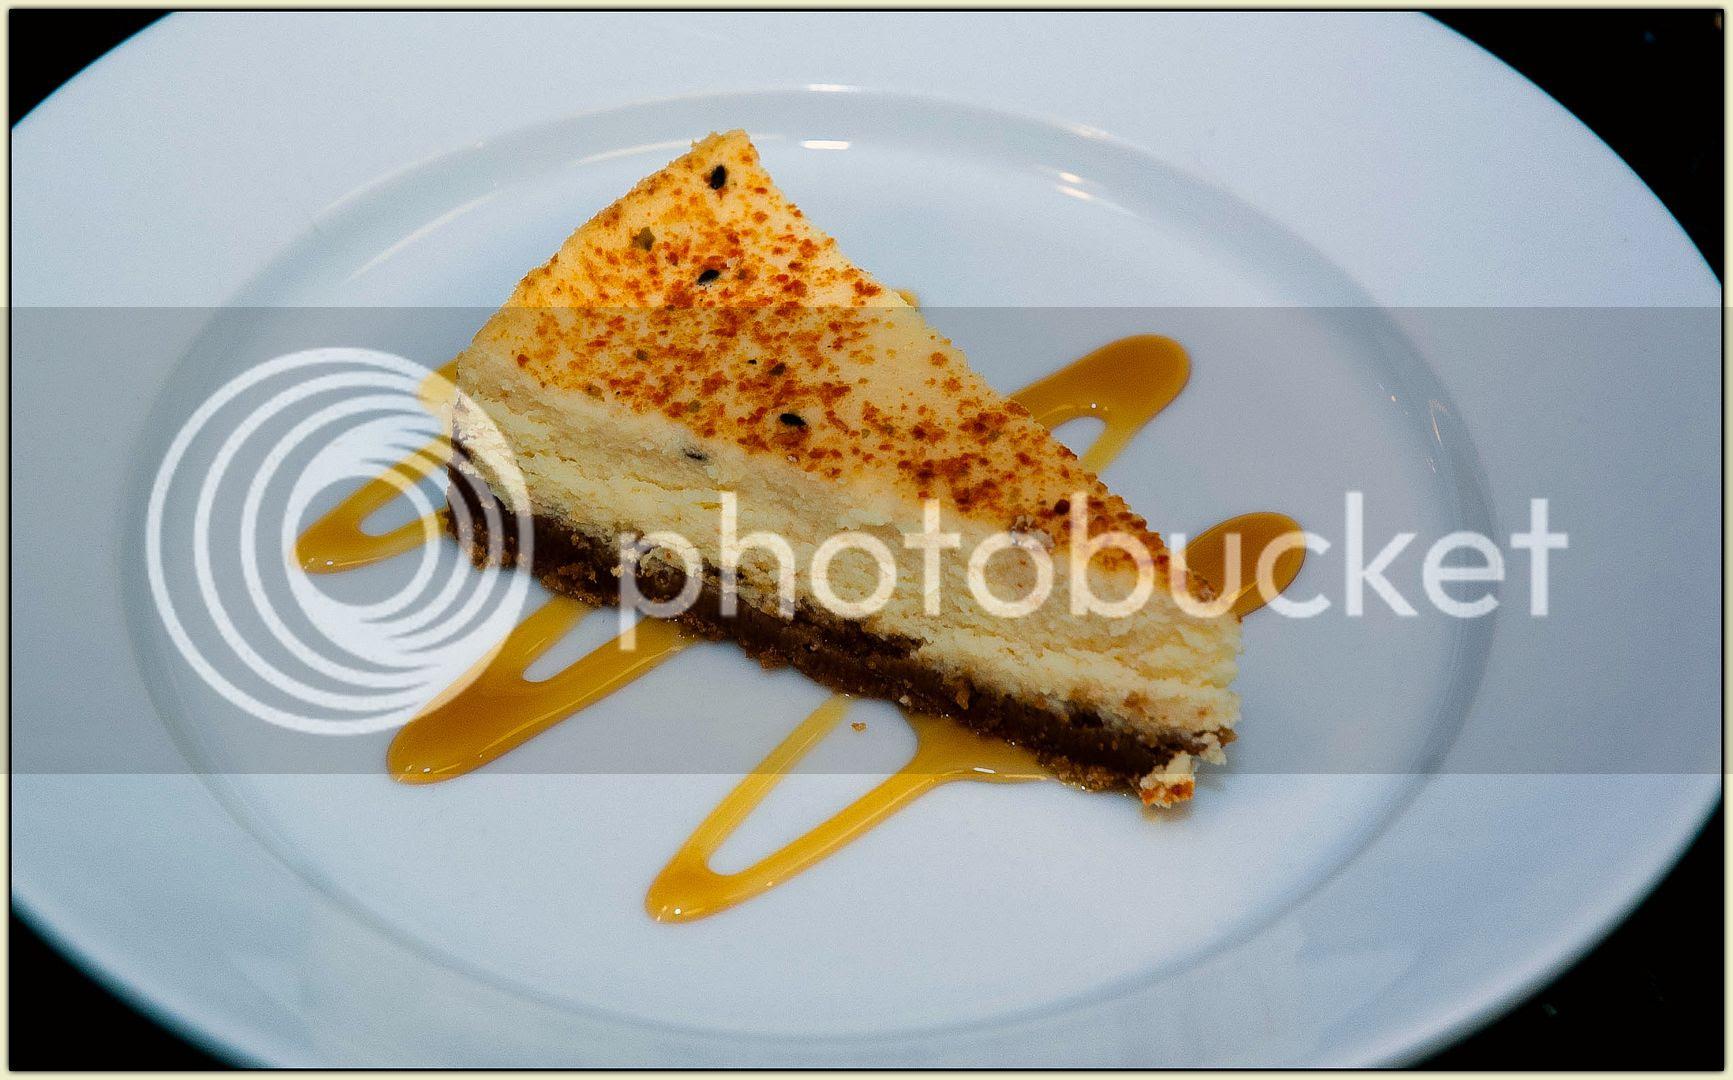 Togarashi cheesecake slice